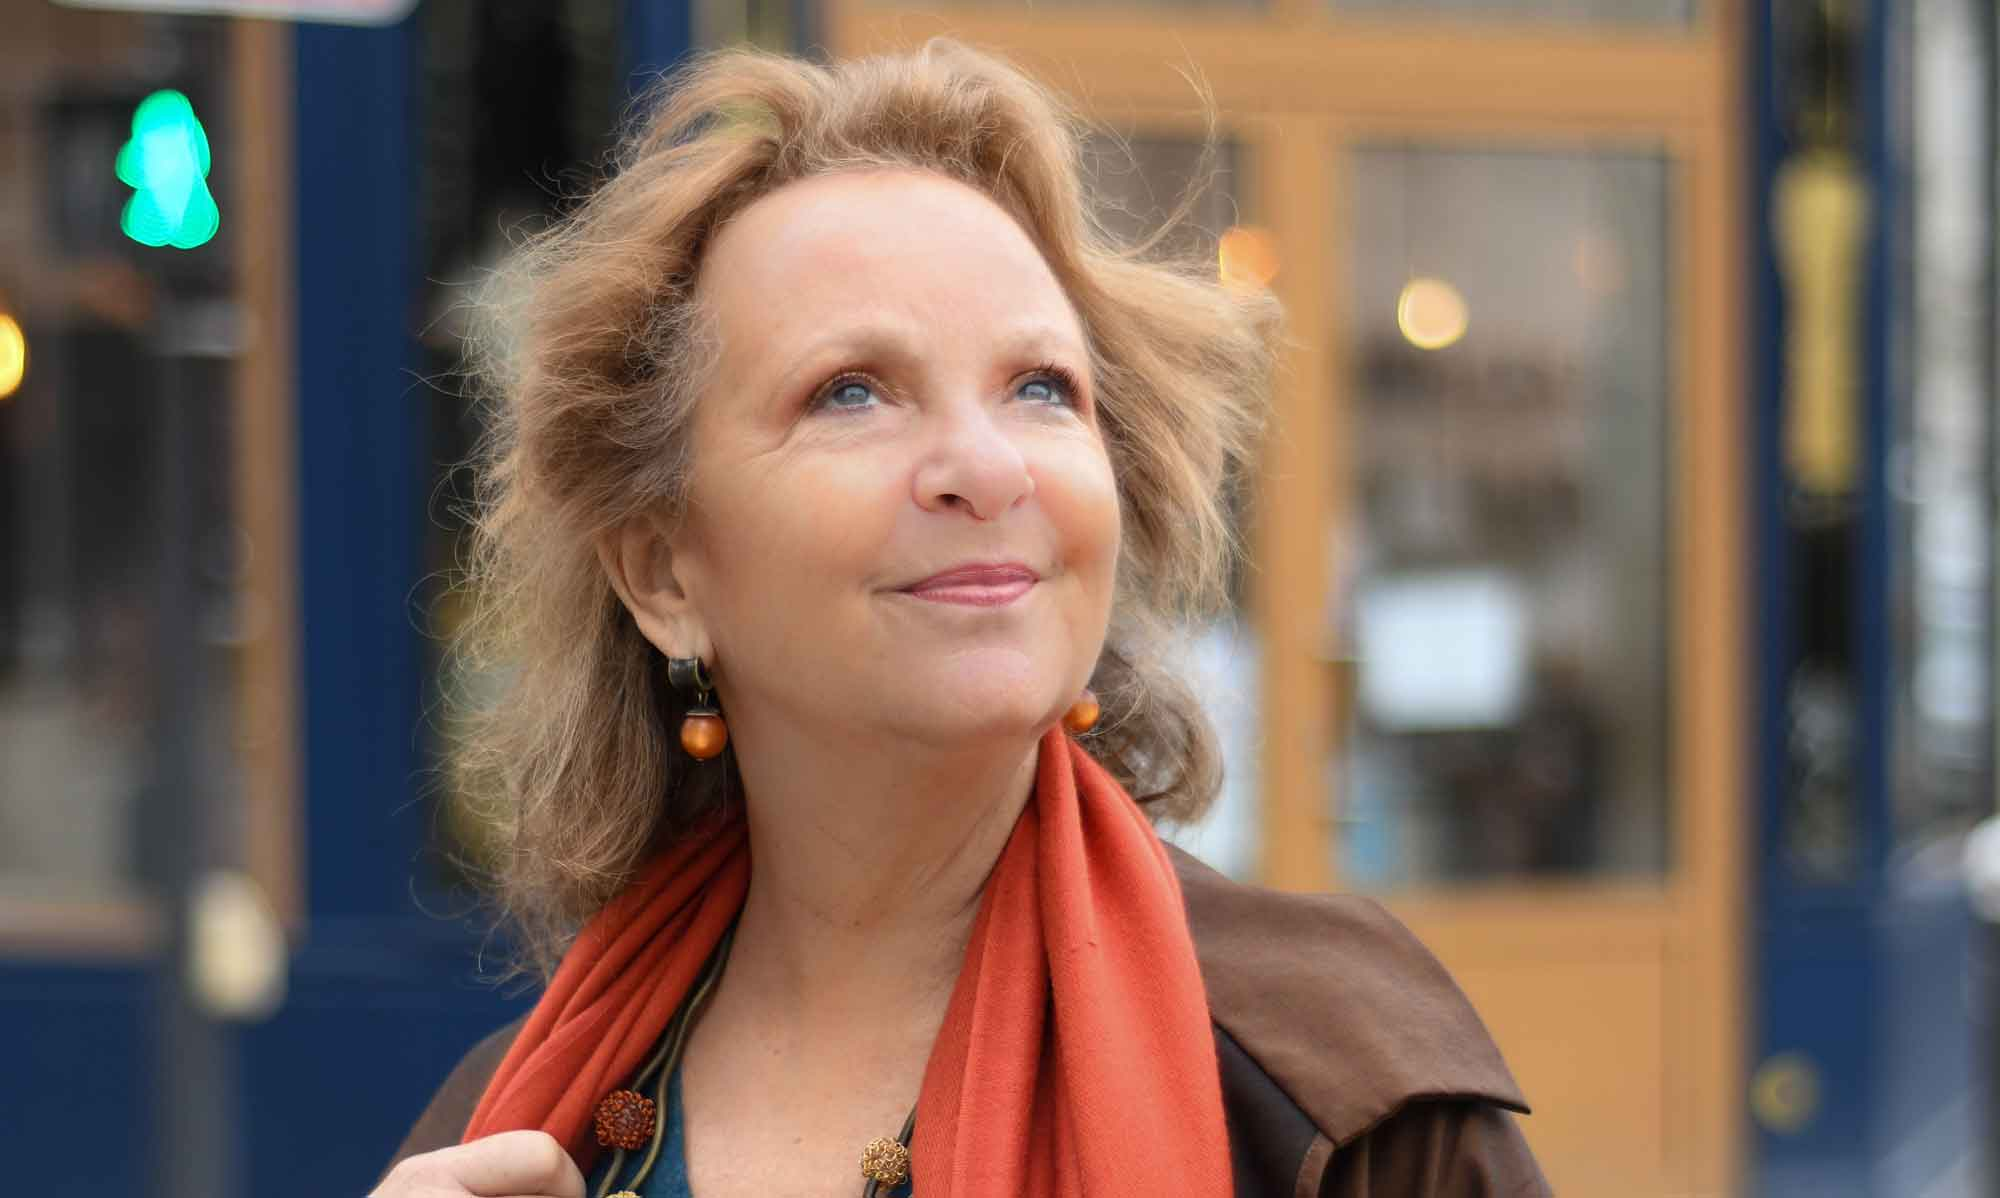 Joan Koenig, Founder and Director of L'Ecole Koenig